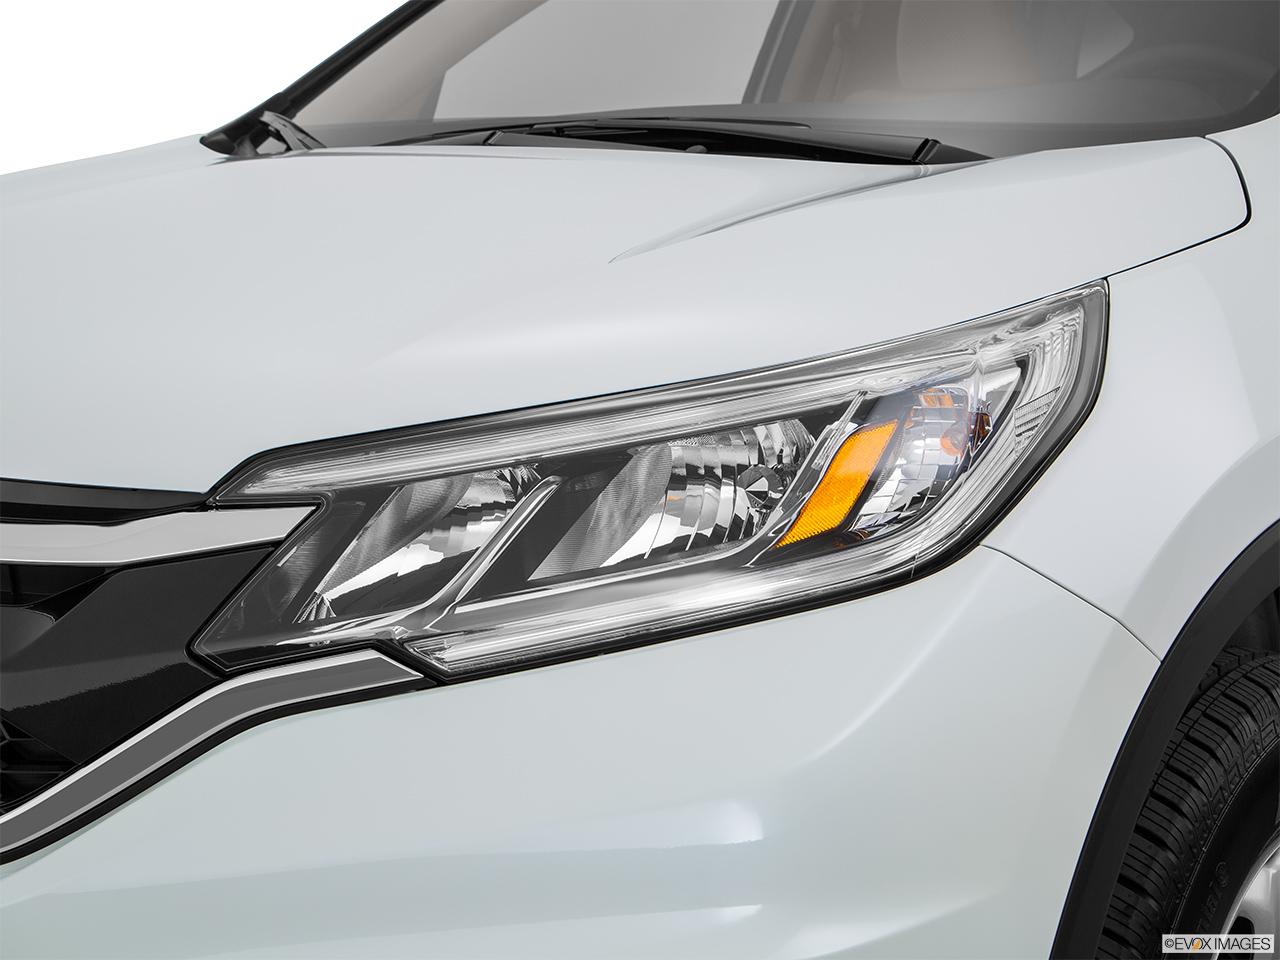 Honda Crv 2016 2 4 Lx 2wd In Saudi Arabia New Car Prices Specs Reviews Amp Photos Yallamotor